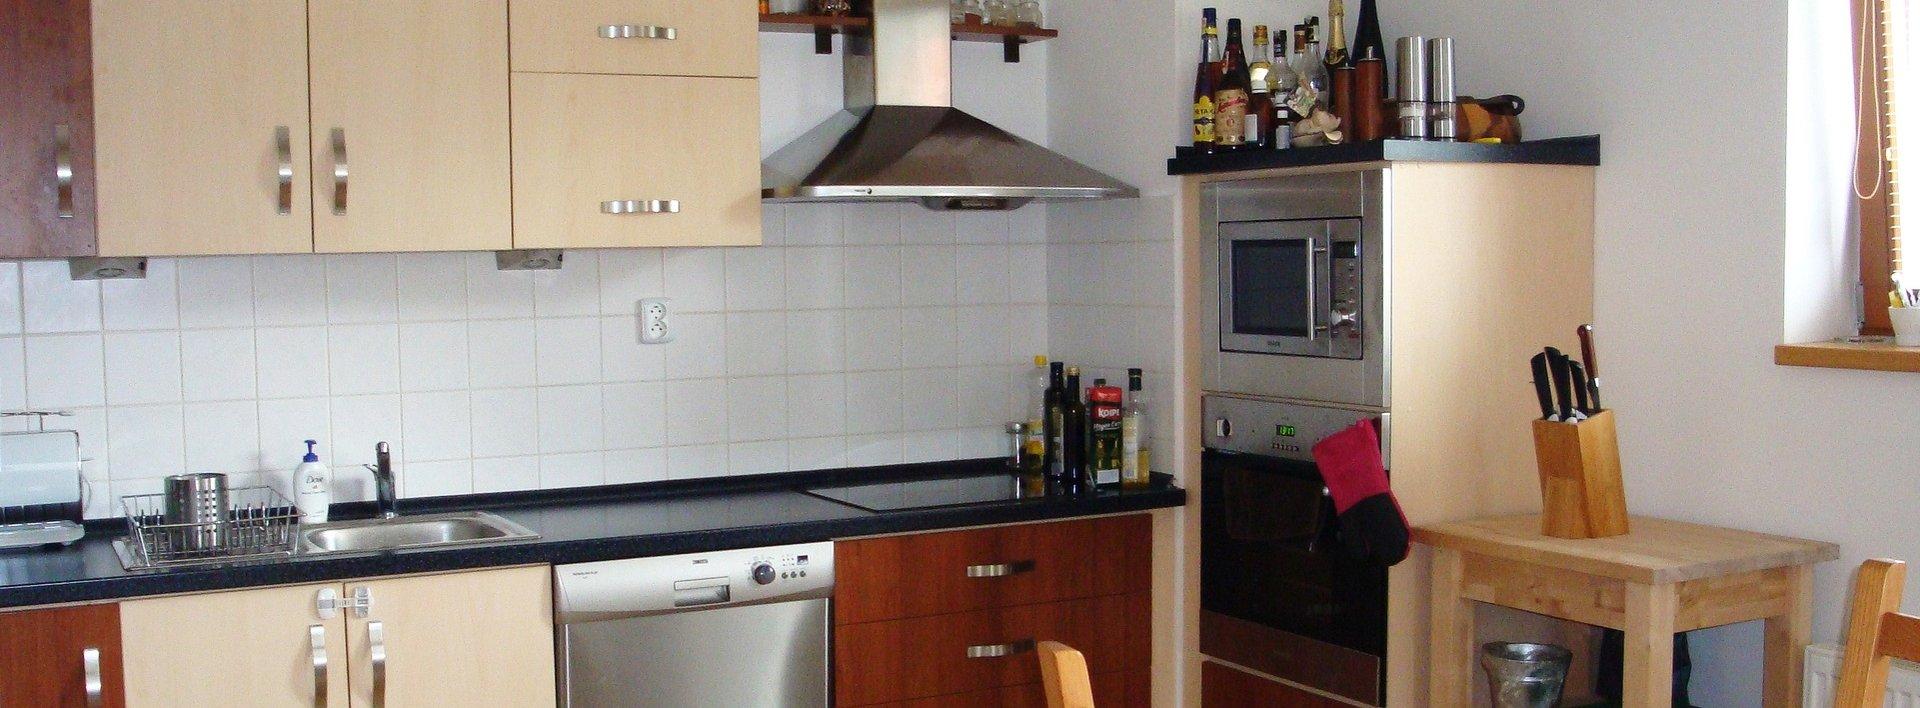 Pronájem pěkného bytu 2+kk, 68m² - Liberec, Ev.č.: N48250